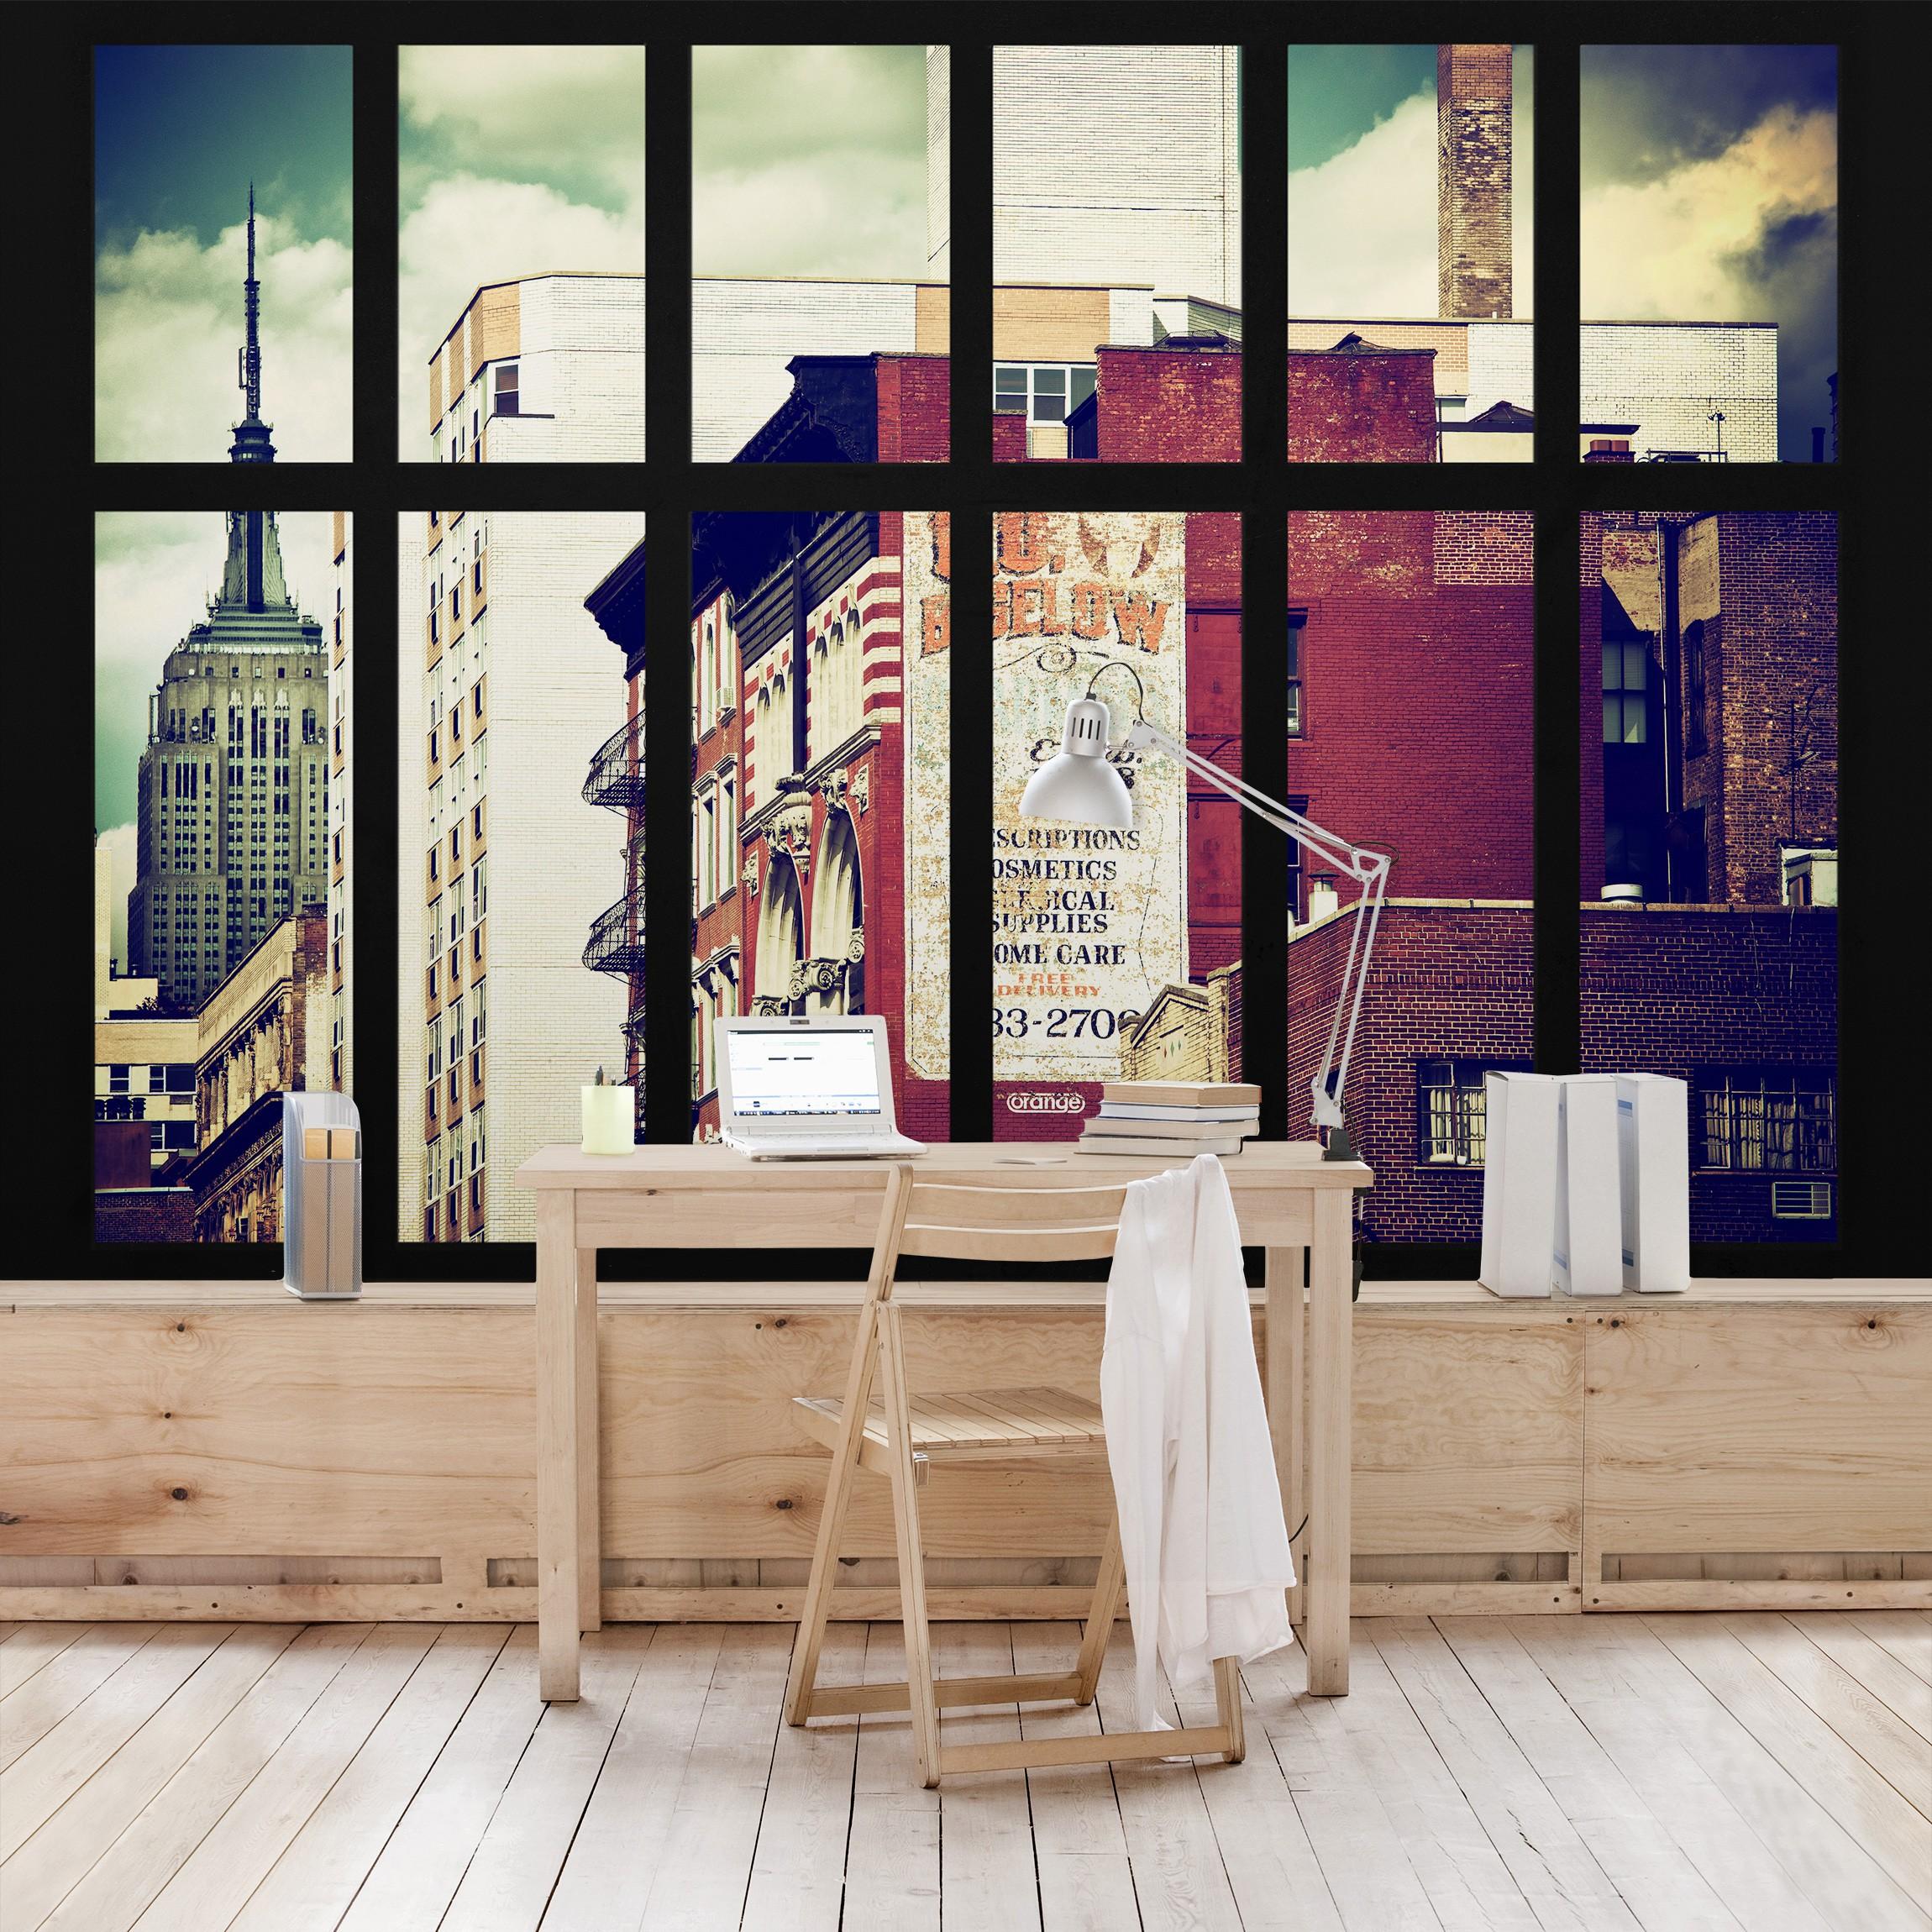 new york fototapete selbstklebend fensterblick auf new york geb ude vintage. Black Bedroom Furniture Sets. Home Design Ideas